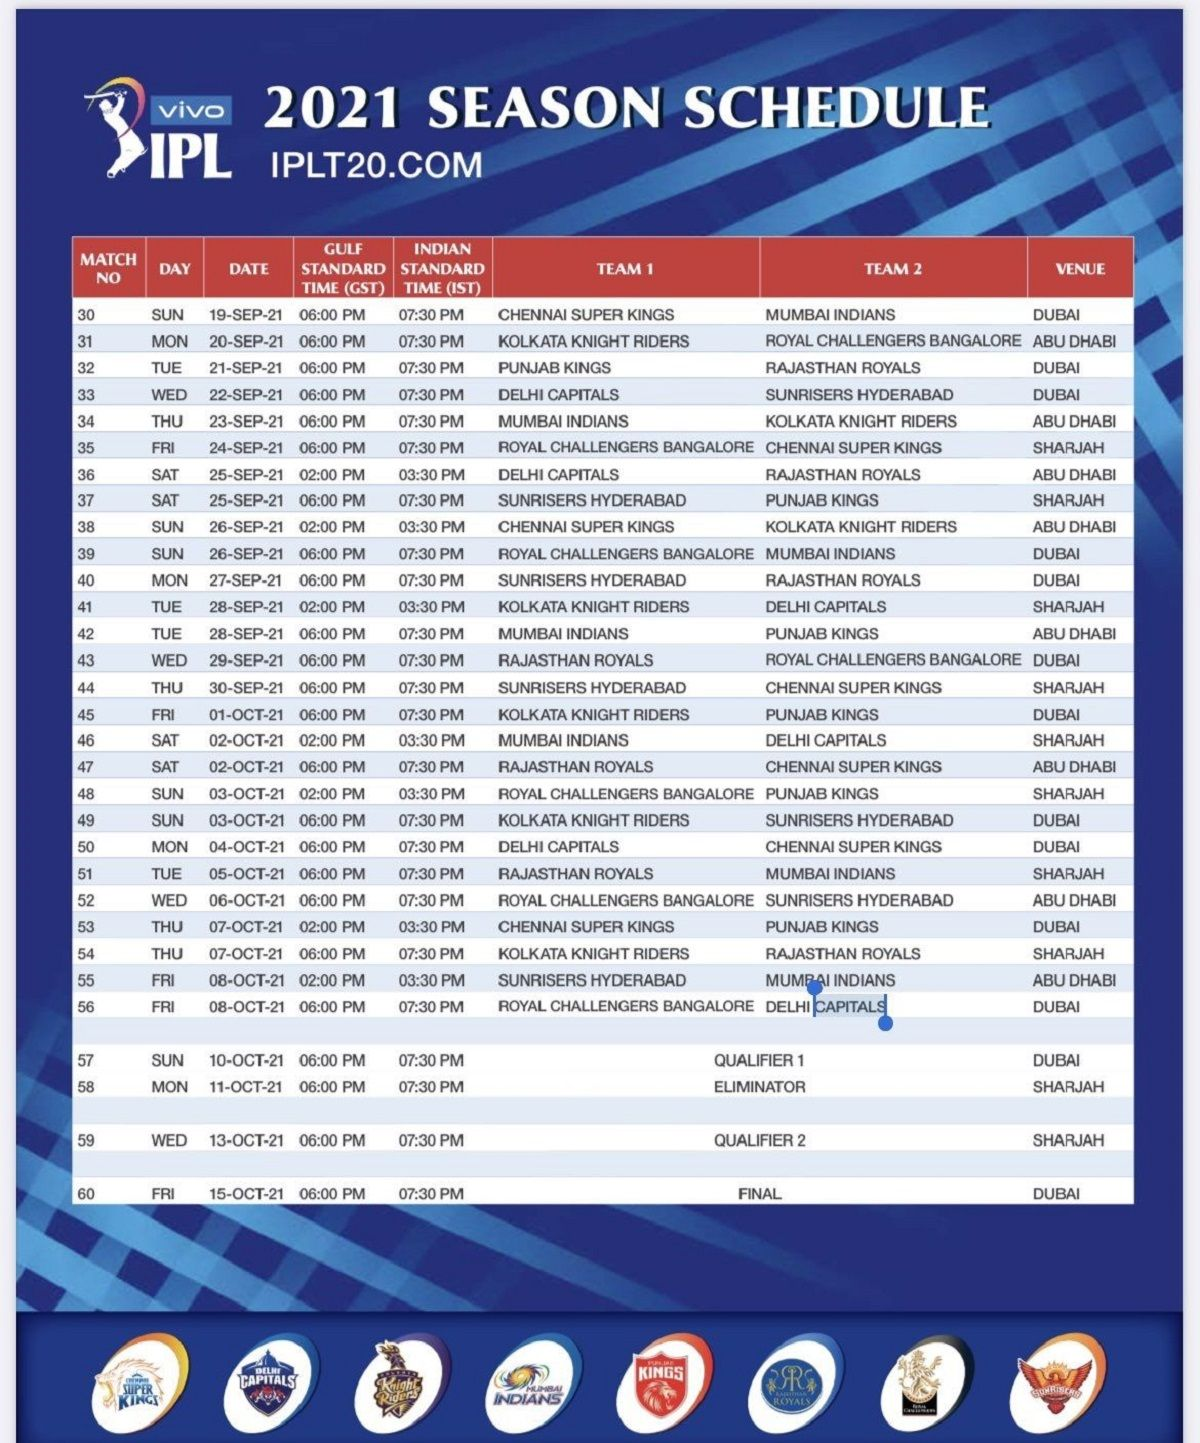 IPL 2021 Part 2 Schedule all matches list